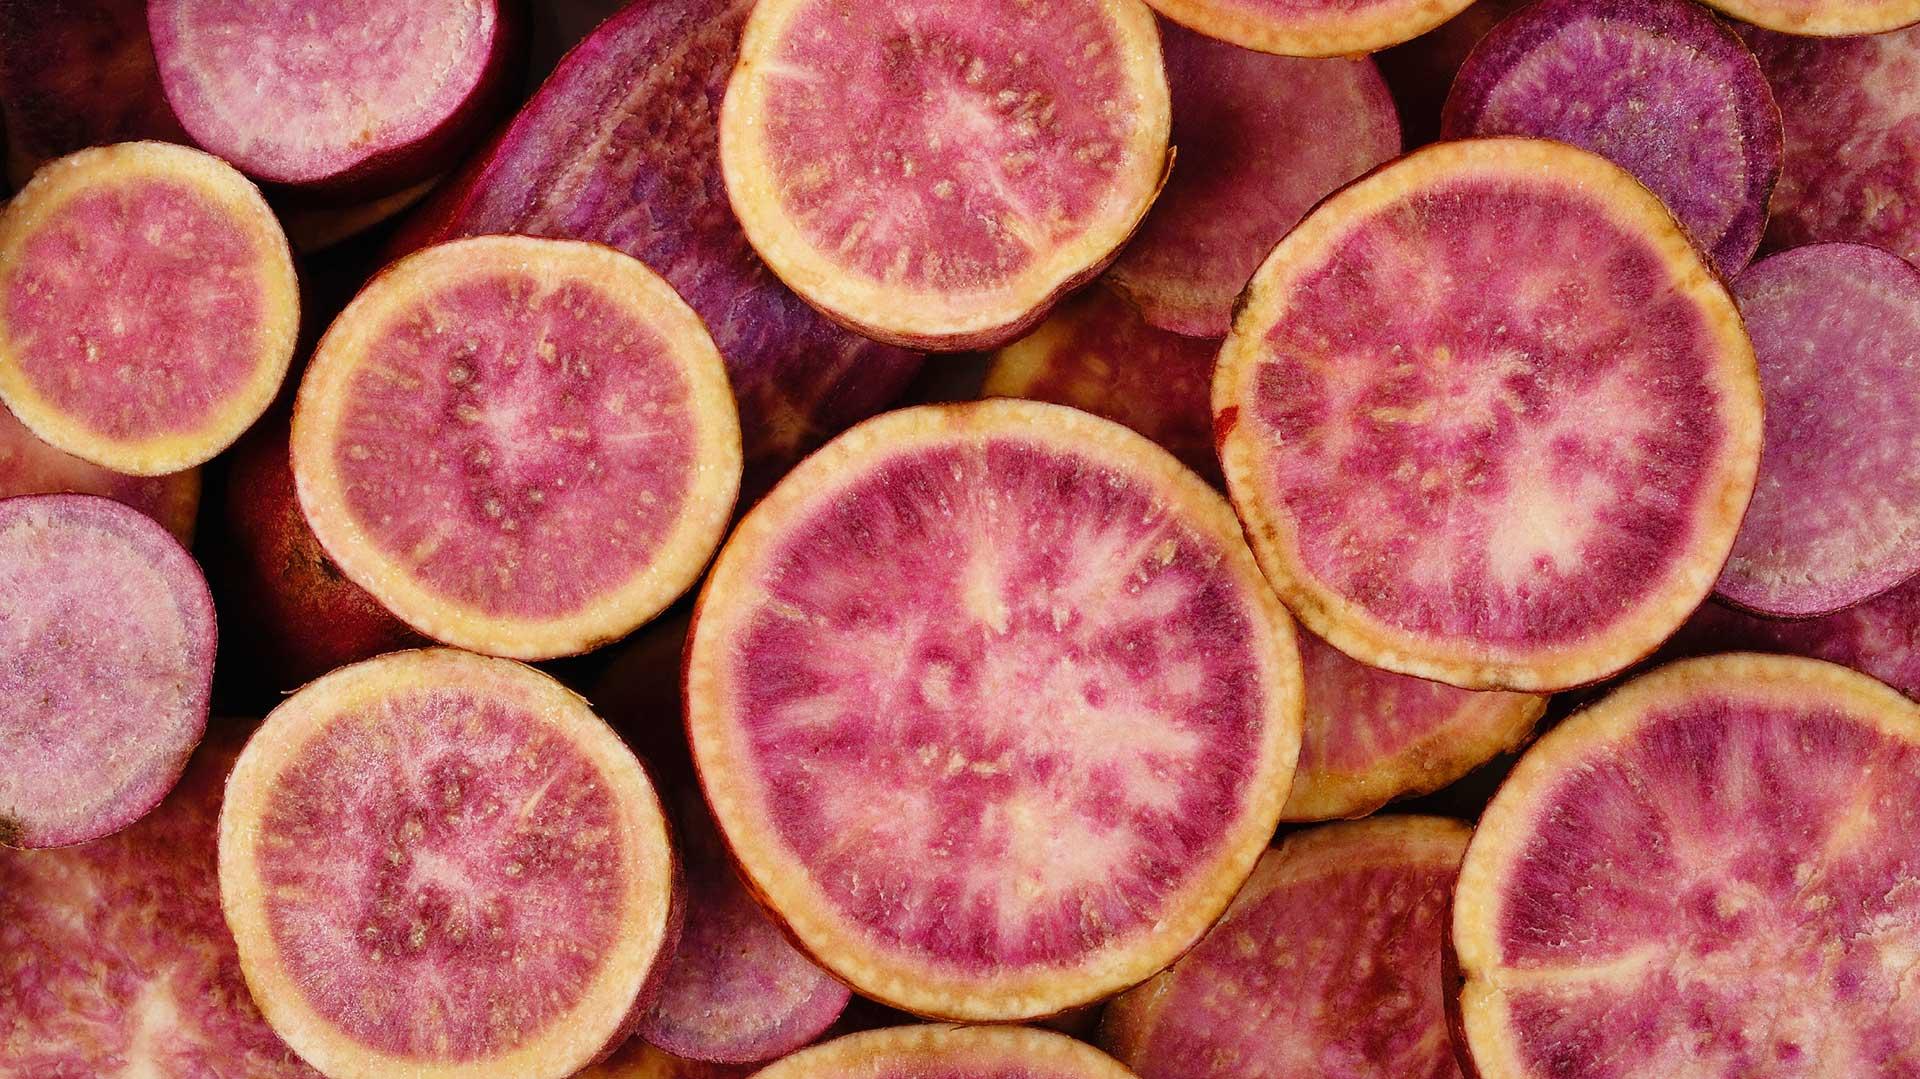 Are Purple Sweet Potat...